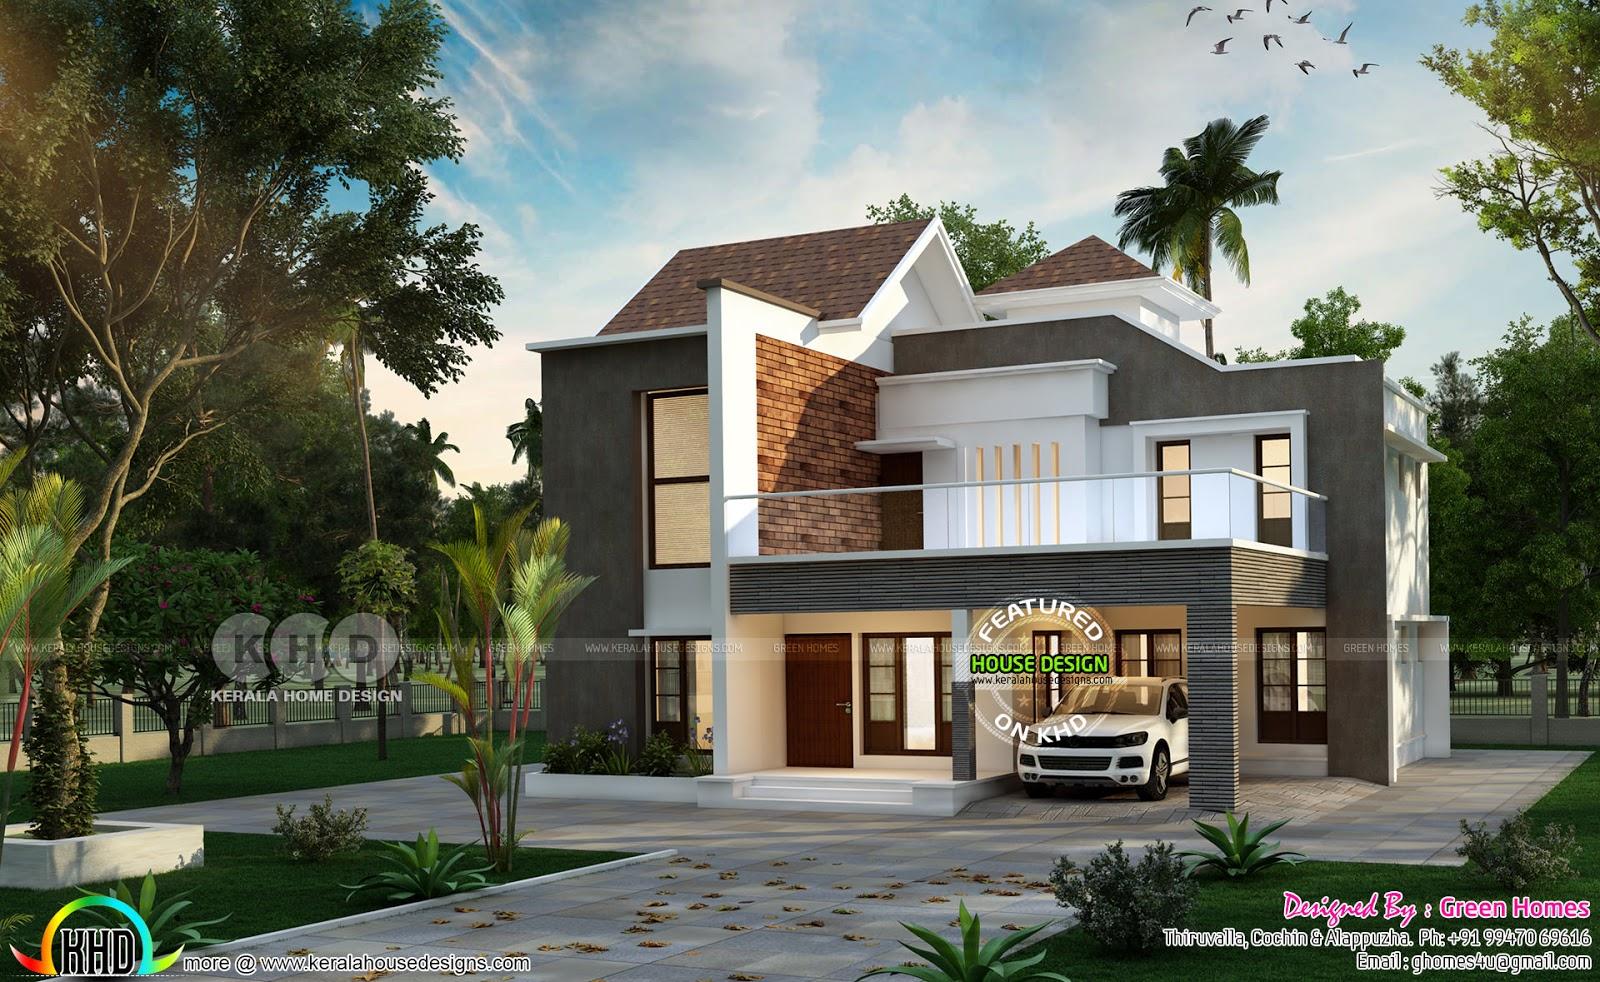 Year 2019 house design starts here | Kerala home design ...